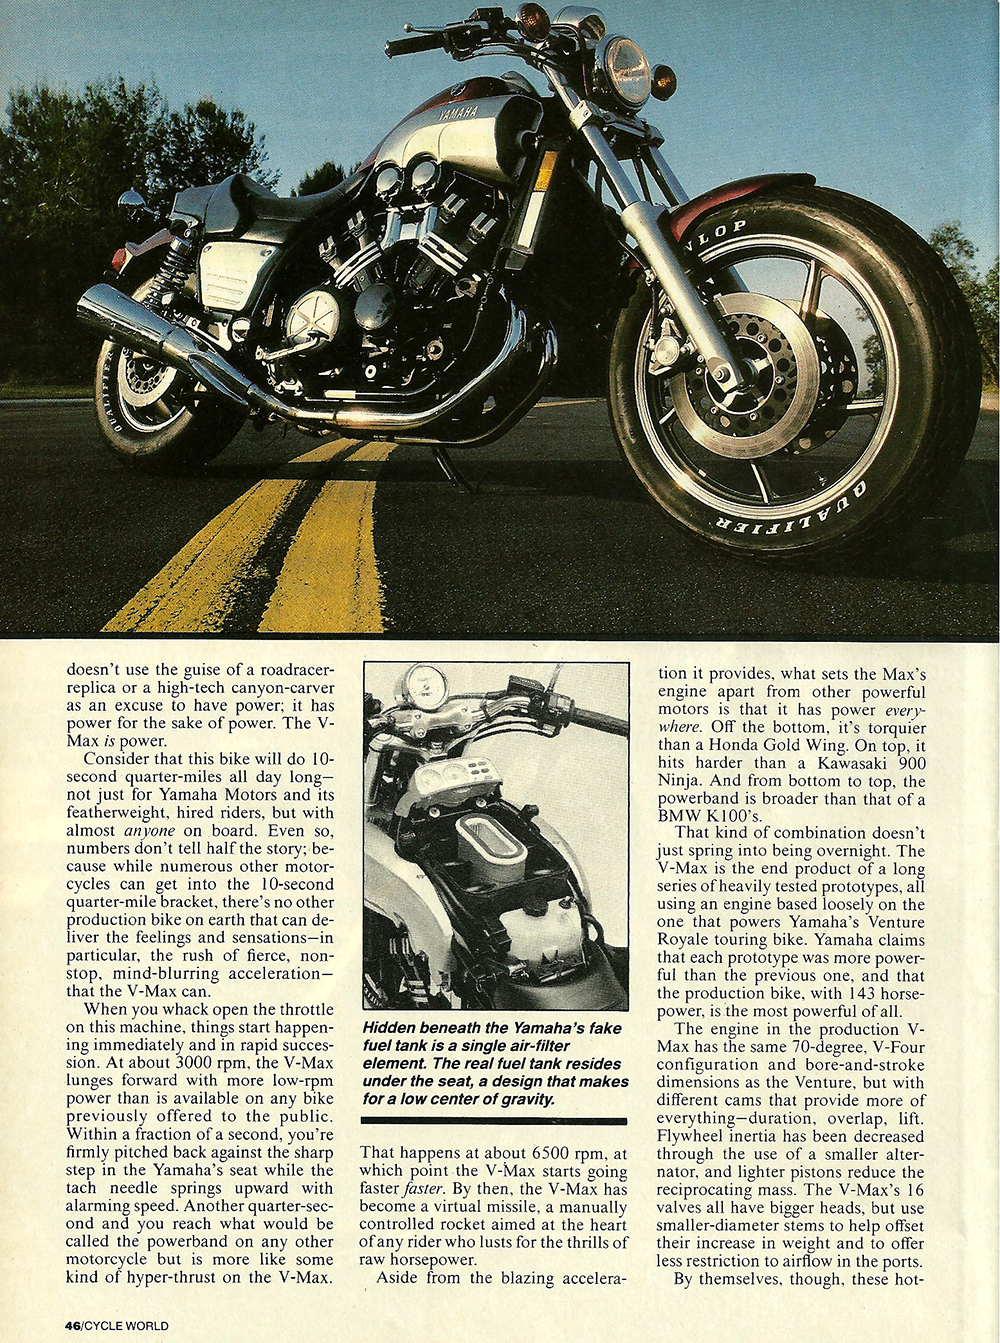 1985 Yamama Vmax 1200 road test 03.jpg